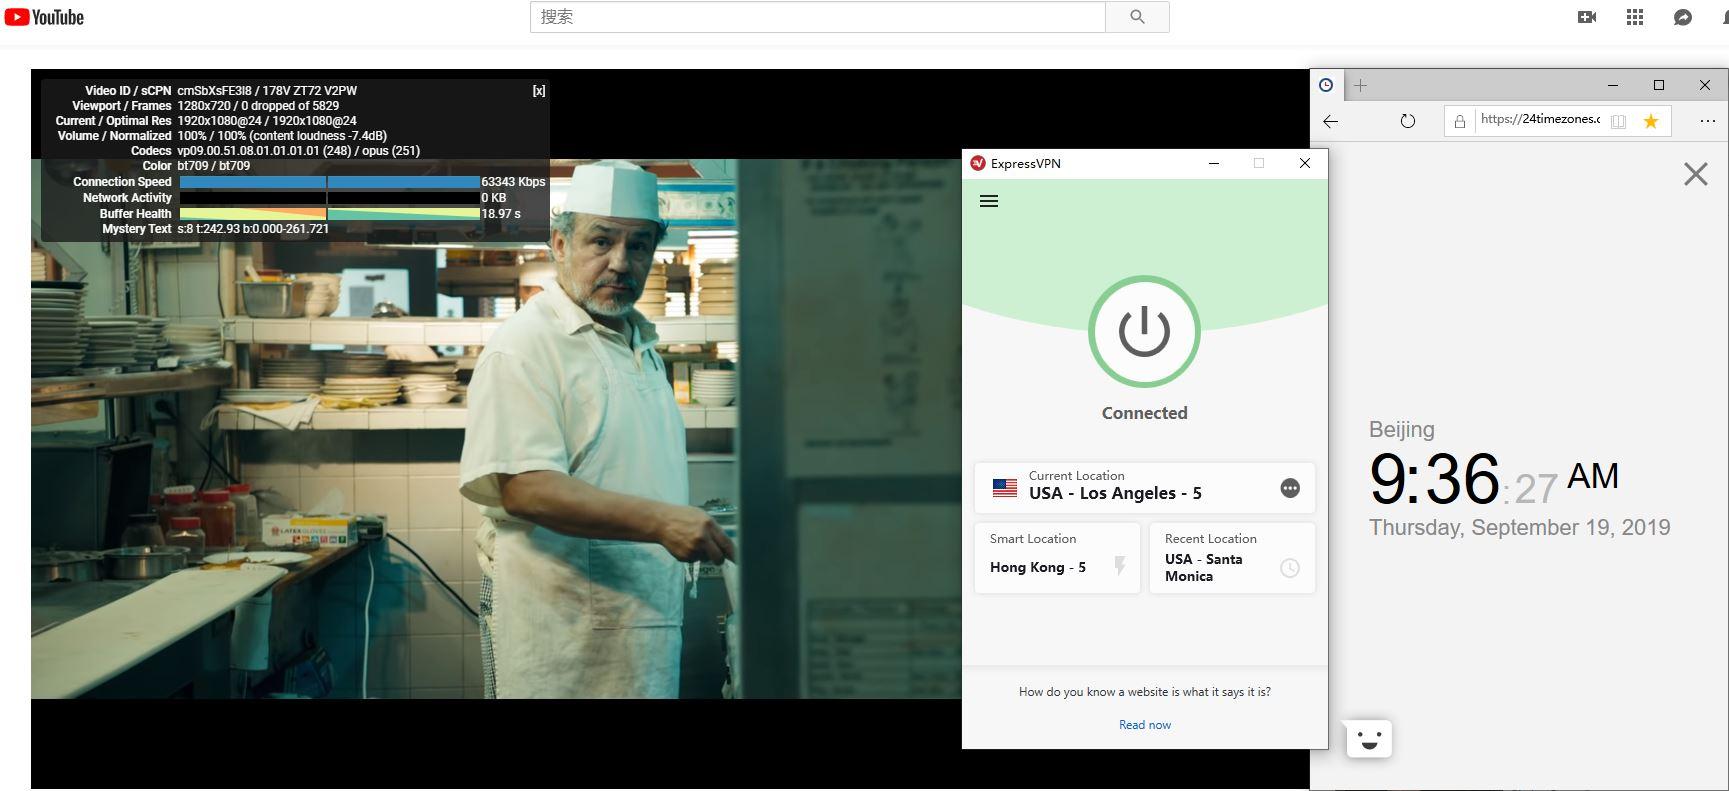 Windows ExpressVPN USA-los angeles-5 服务器 中国VPN翻墙 科学上网 YouTube连接速度-20190919